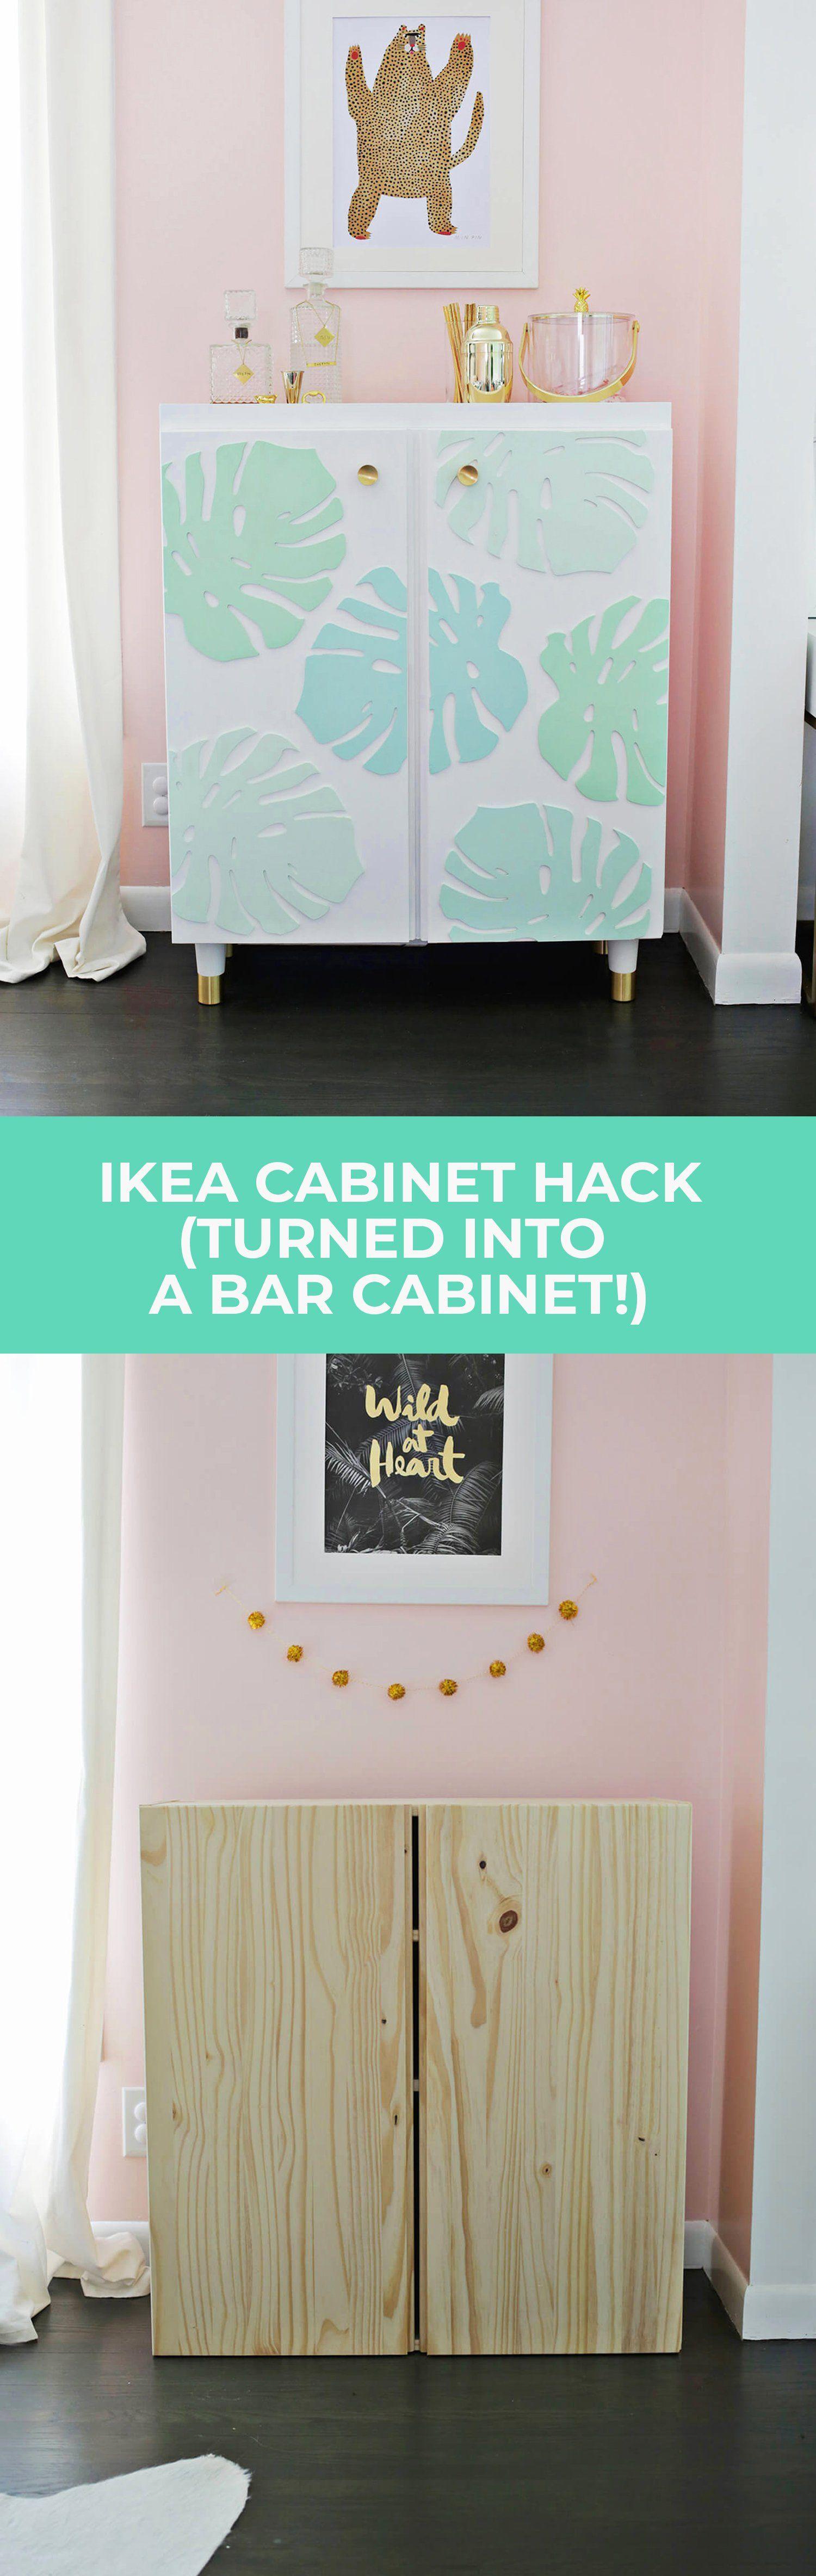 Ikea IVAR Cabinet Hack Turned Into A Bar Cabinet – A Beautiful